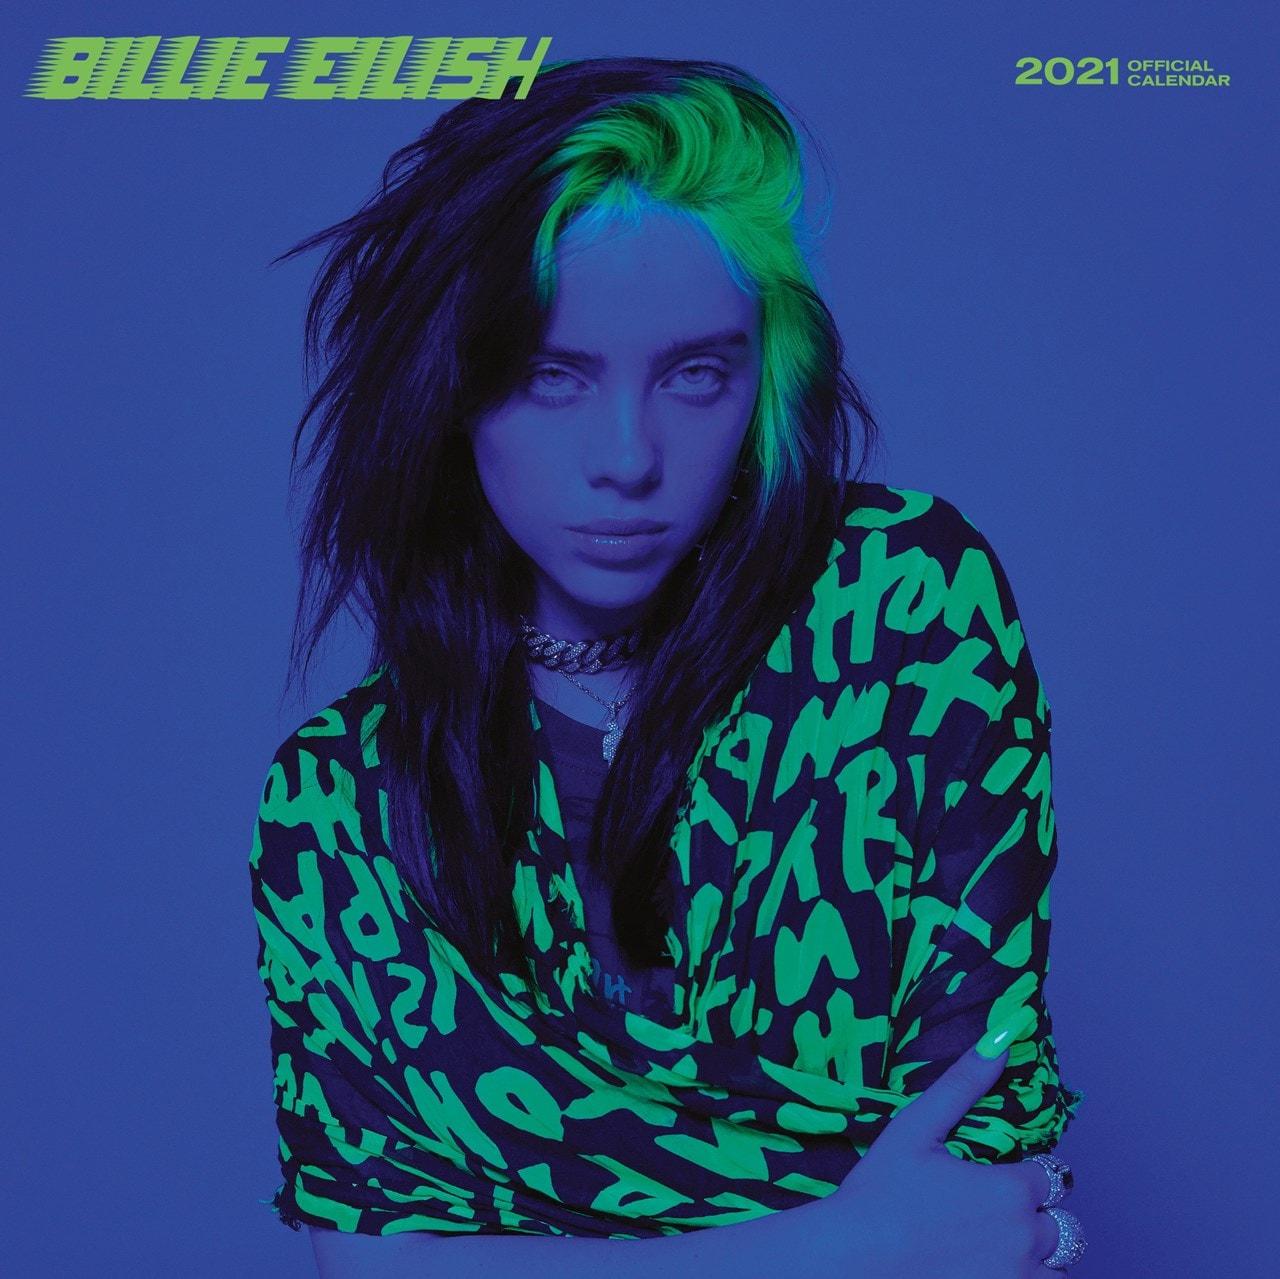 Billie Eilish: Square 2021 Calendar - 1